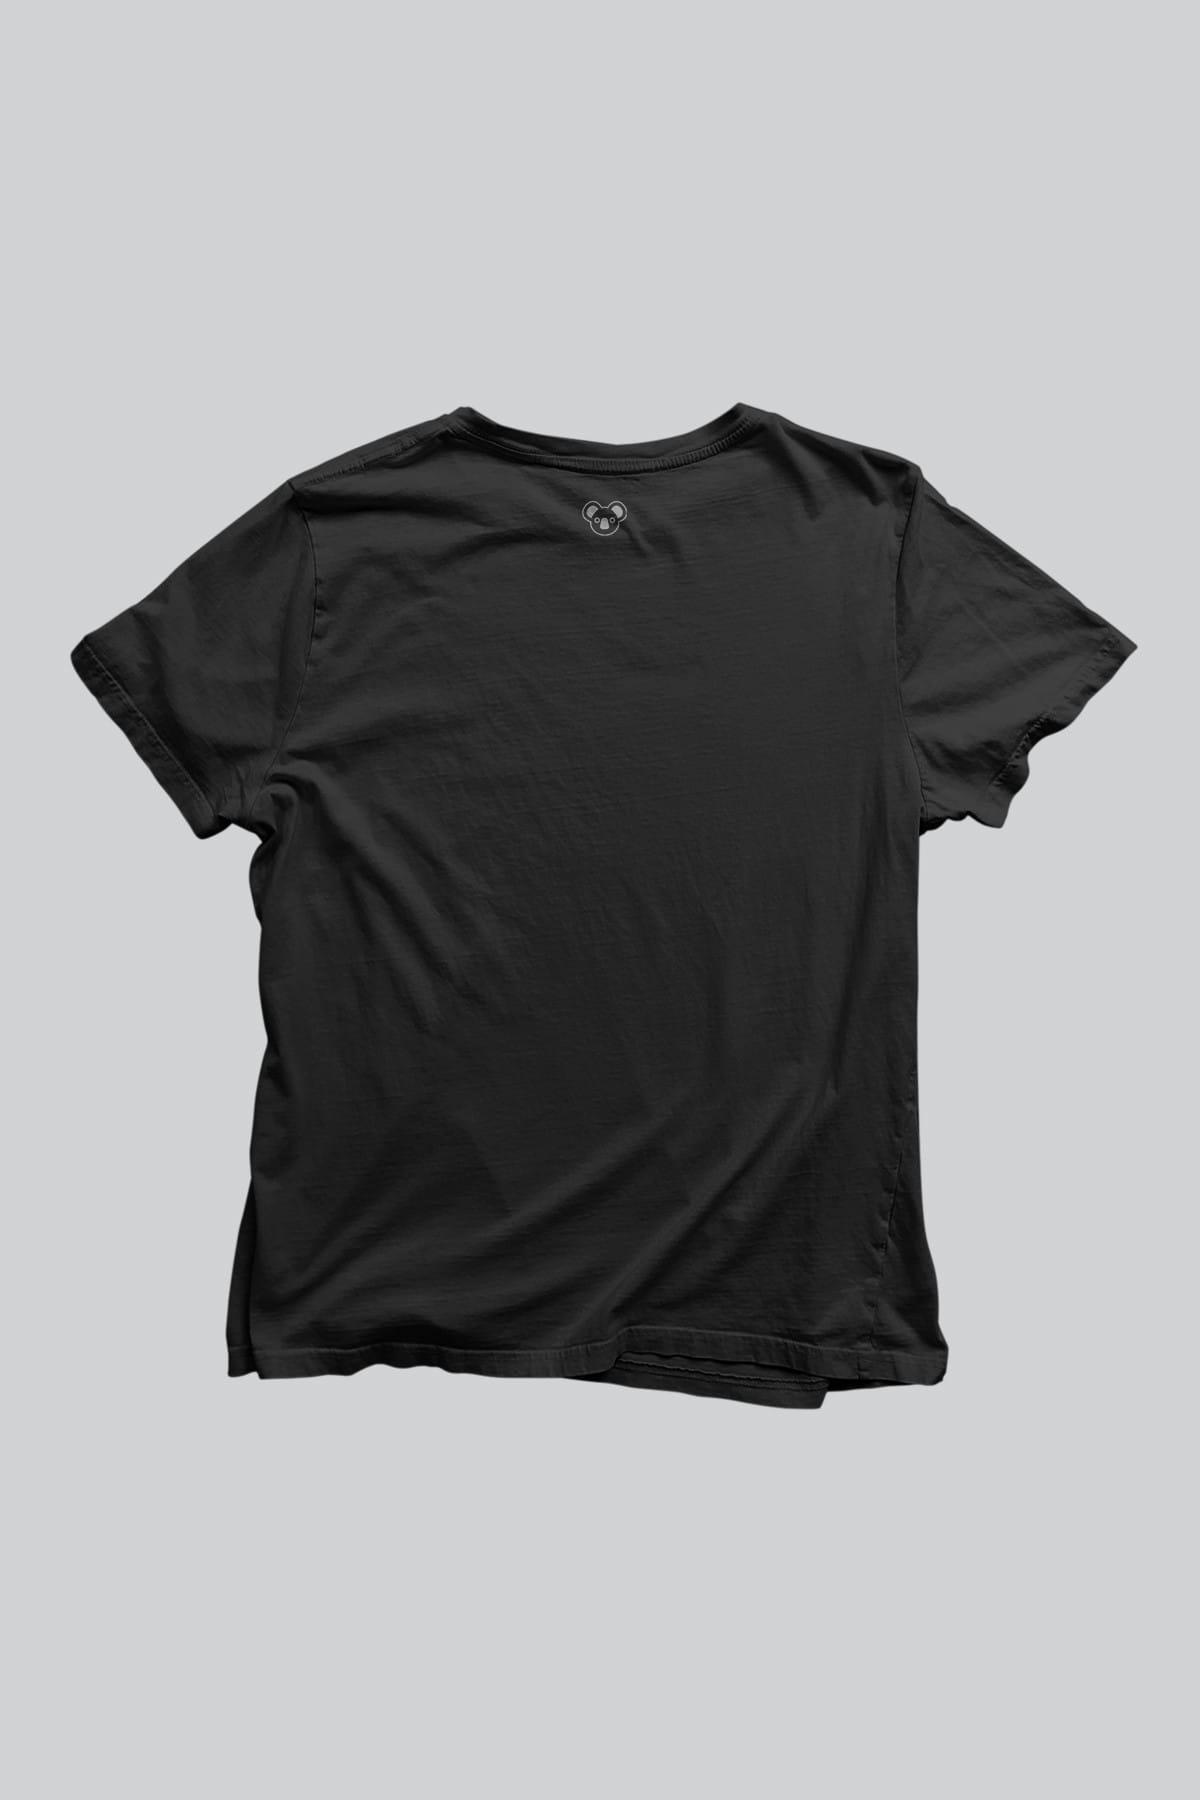 Koala Erkek Siyah T-shirt TPET001STHEPIANO 2